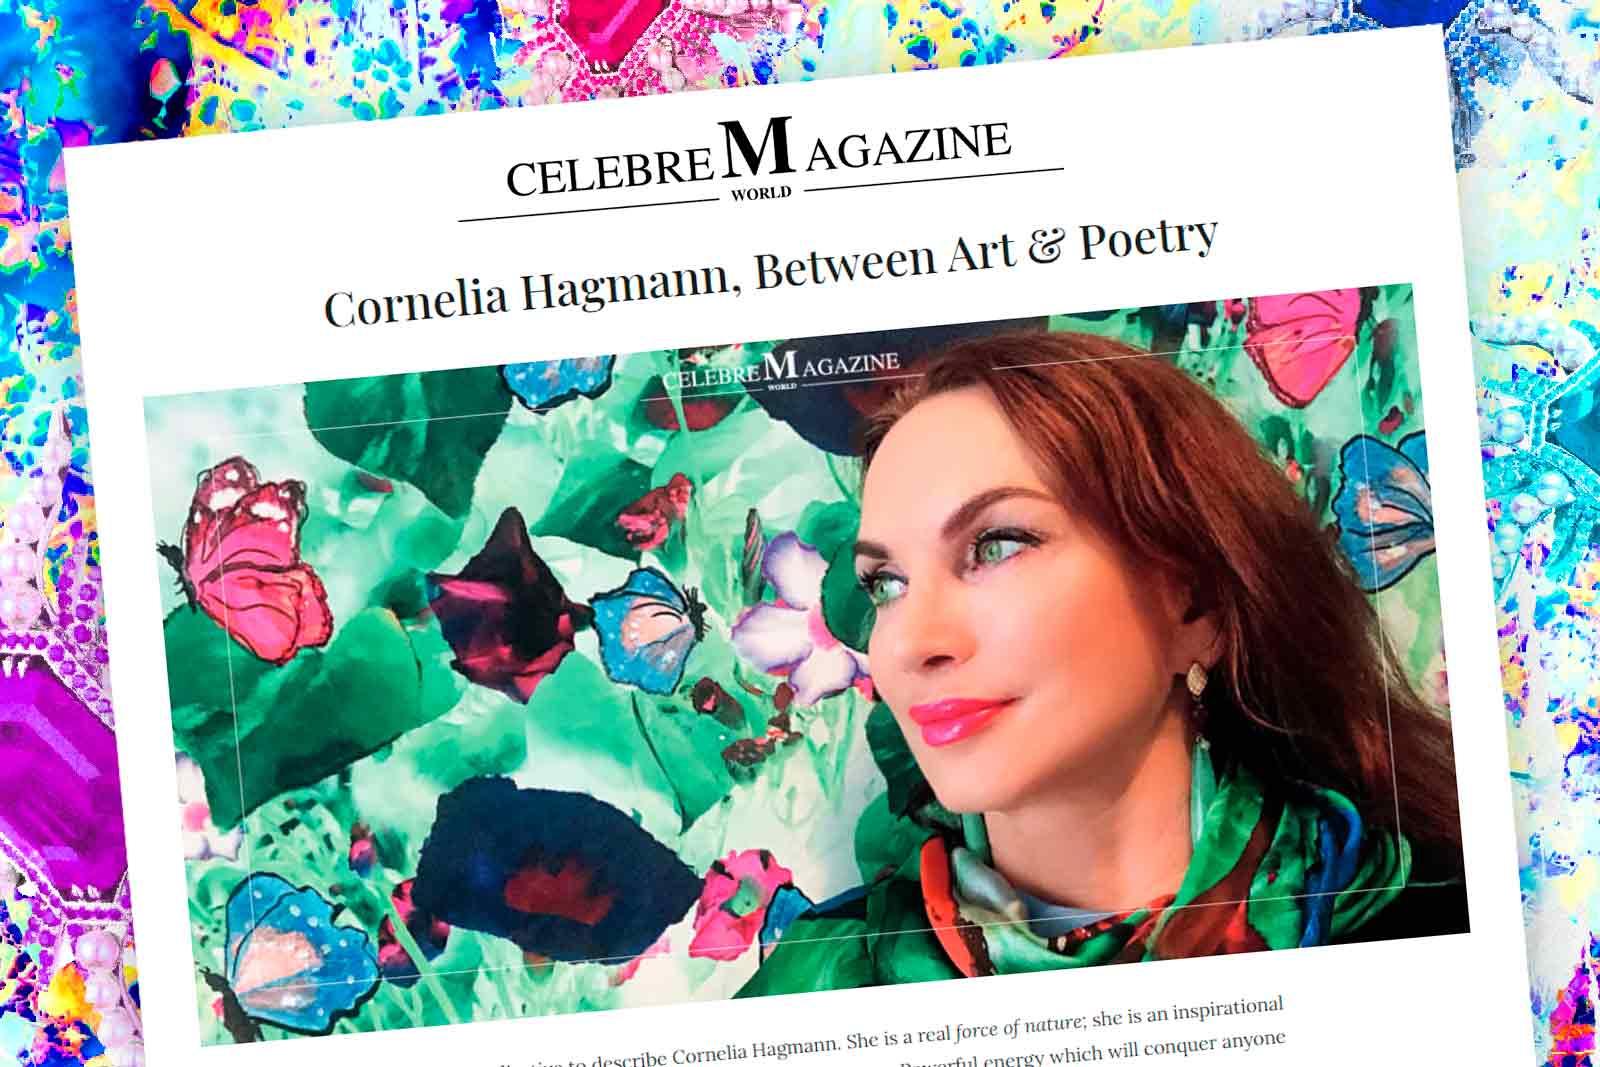 Cornelia Hagmann Contemporary Artist Paintings Flowers Colors La Galleria Pareo Foulard Silk Scarves Scarf Seiden Schals Art Design Artist Exhibition